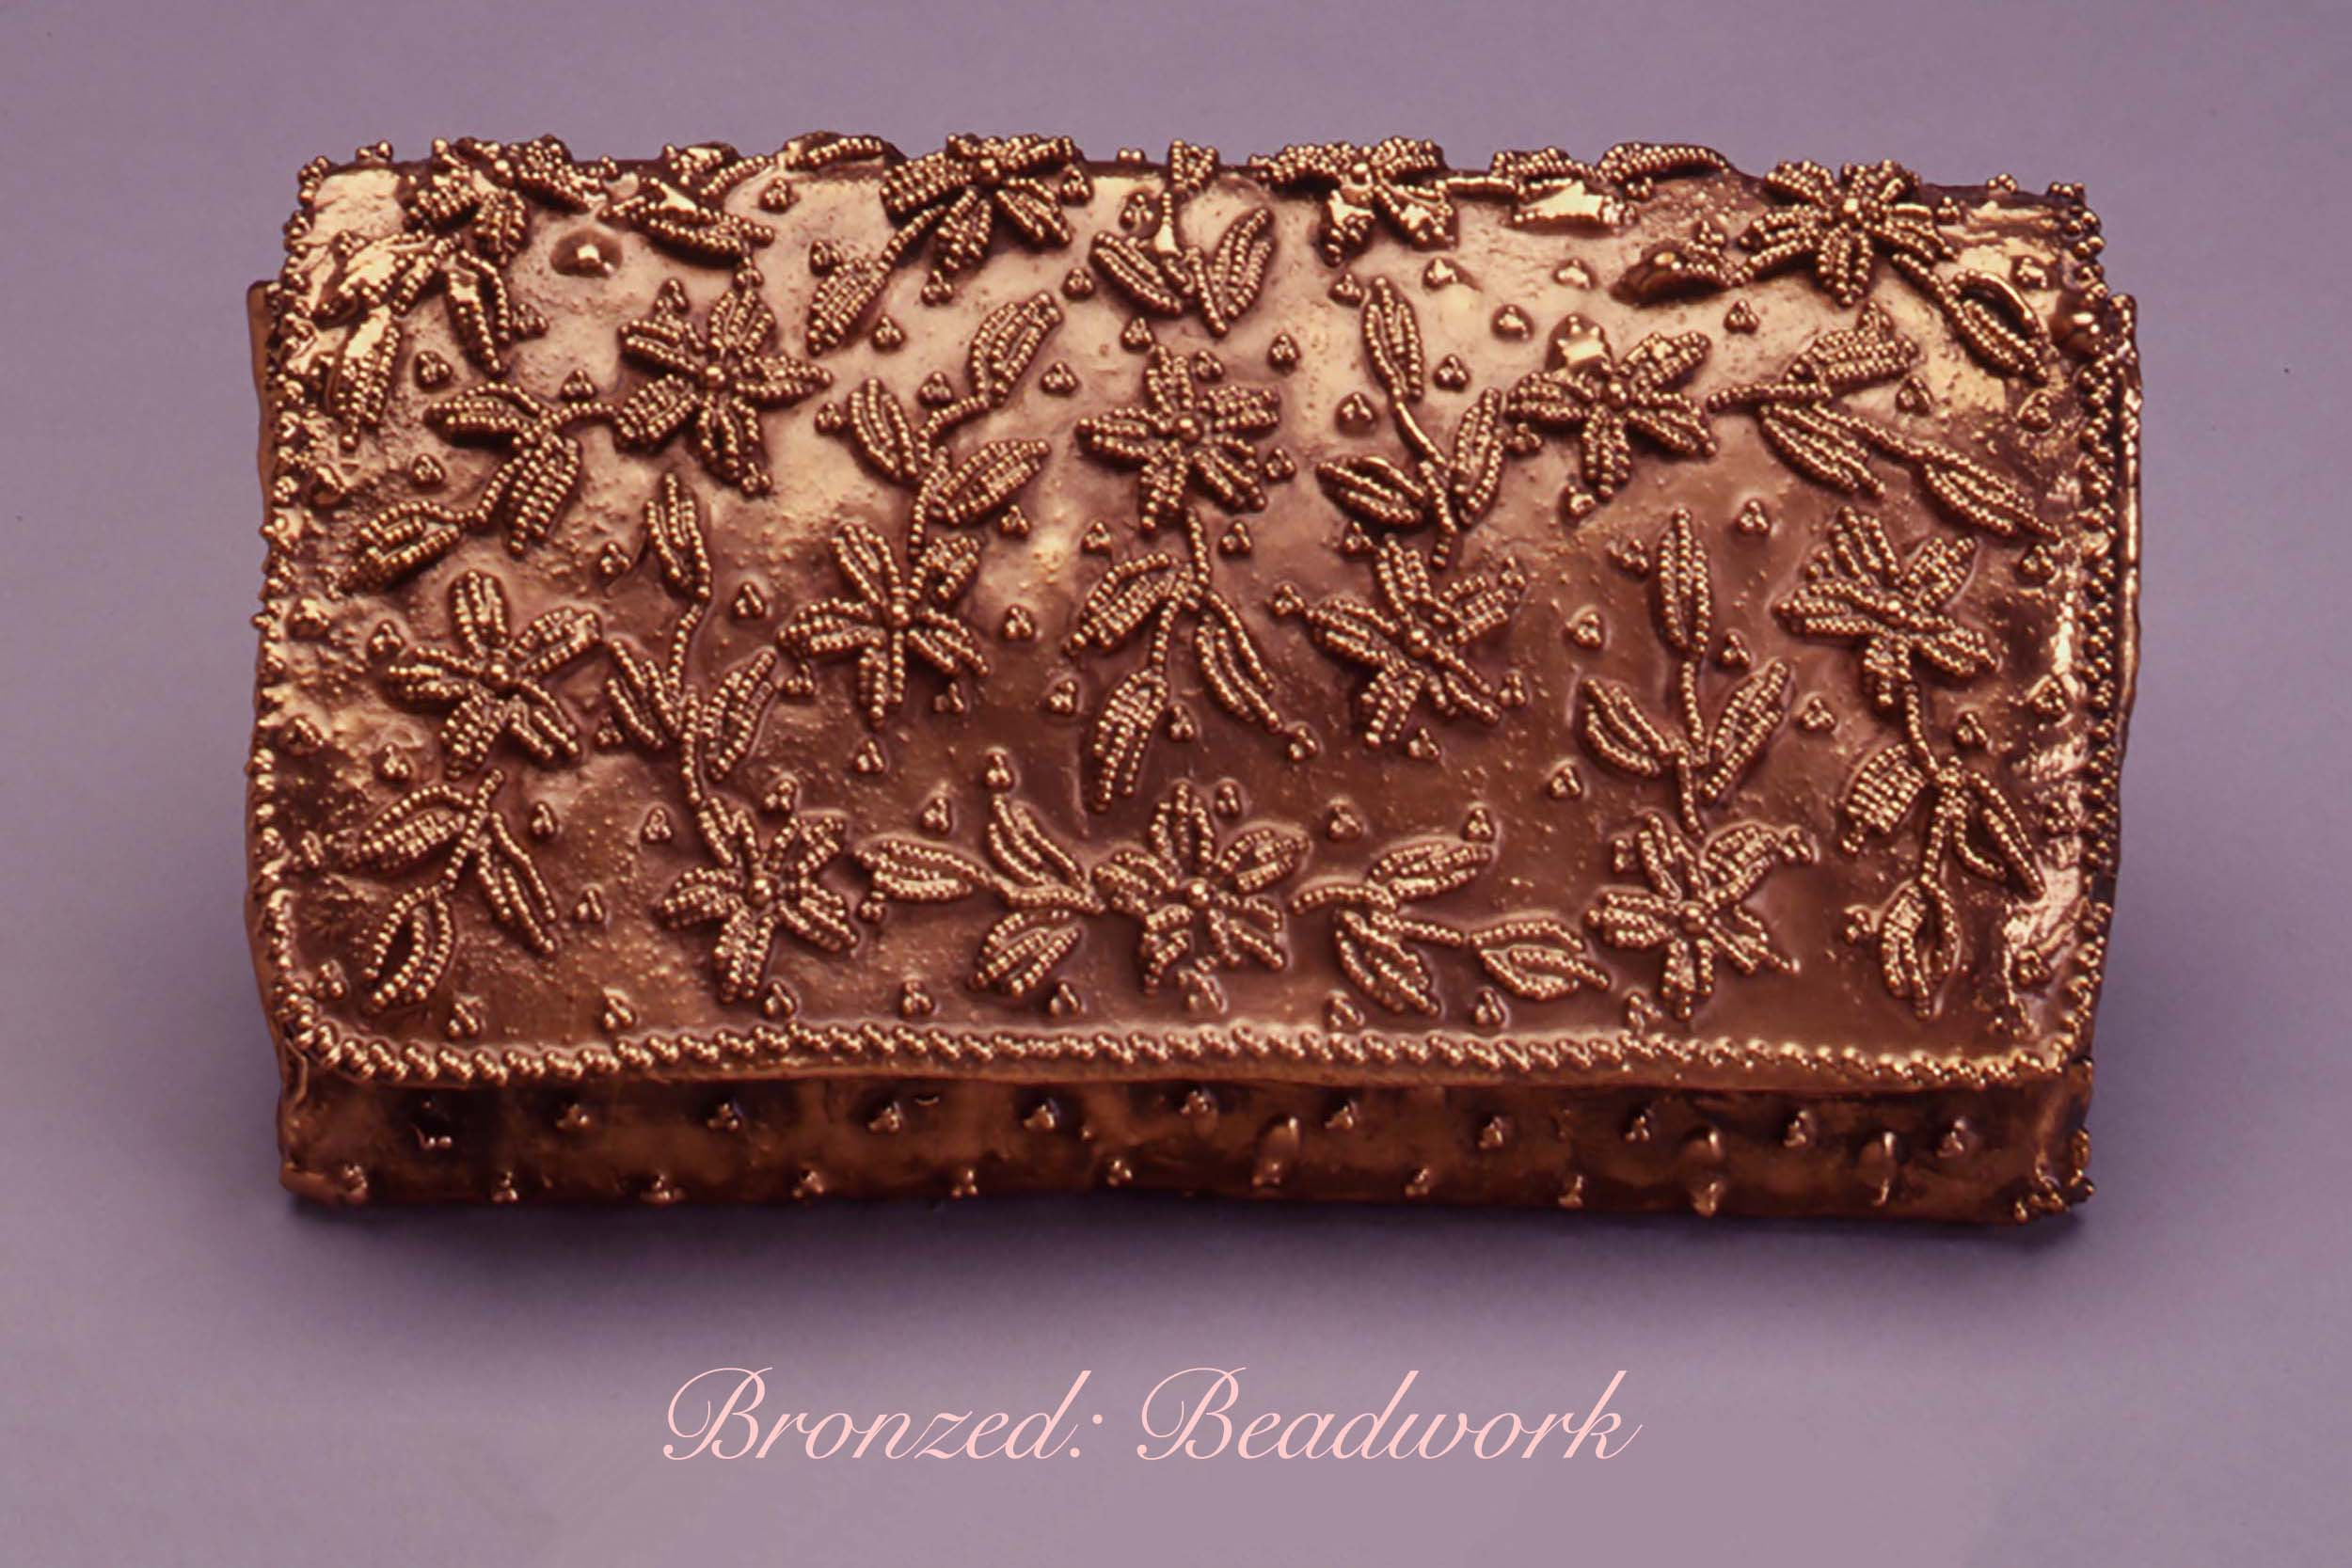 Bronzed-beadwork-ps-txt.jpg